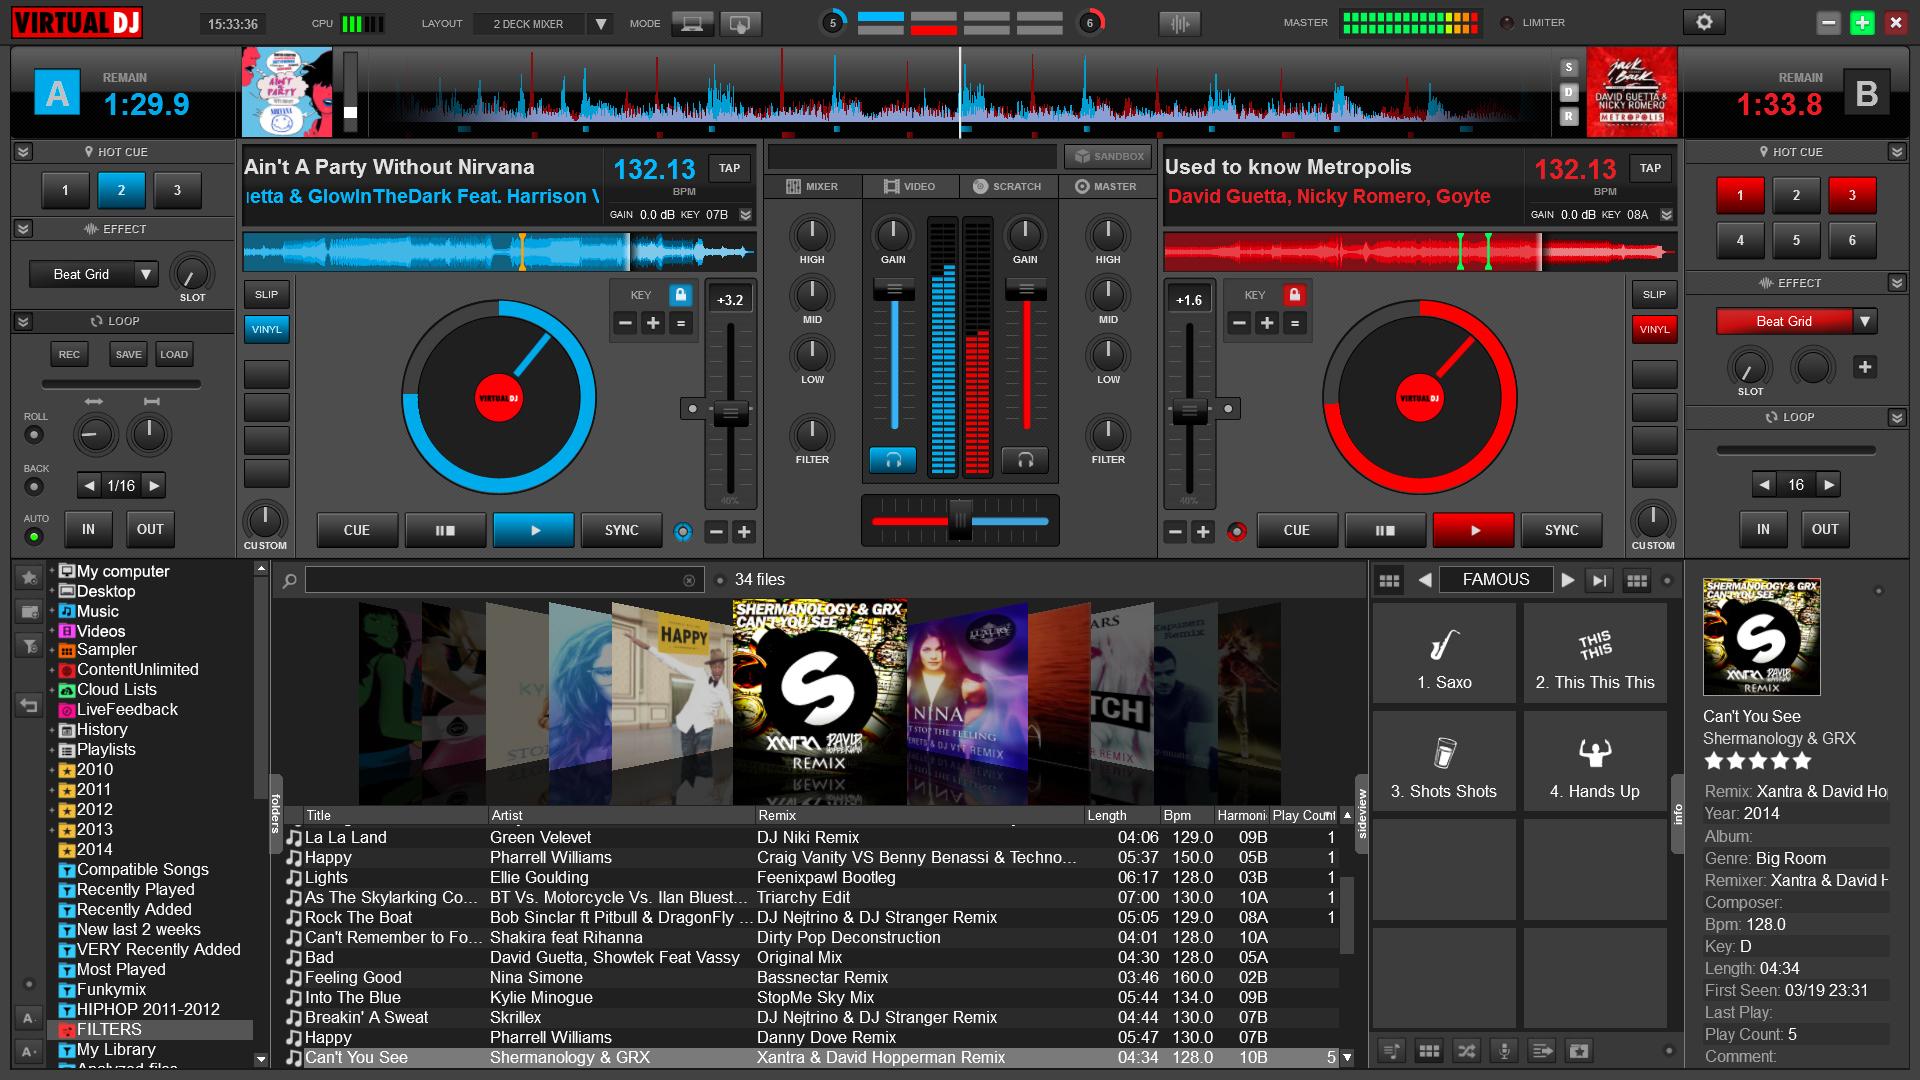 Virtual DJ Pro 8 free crack